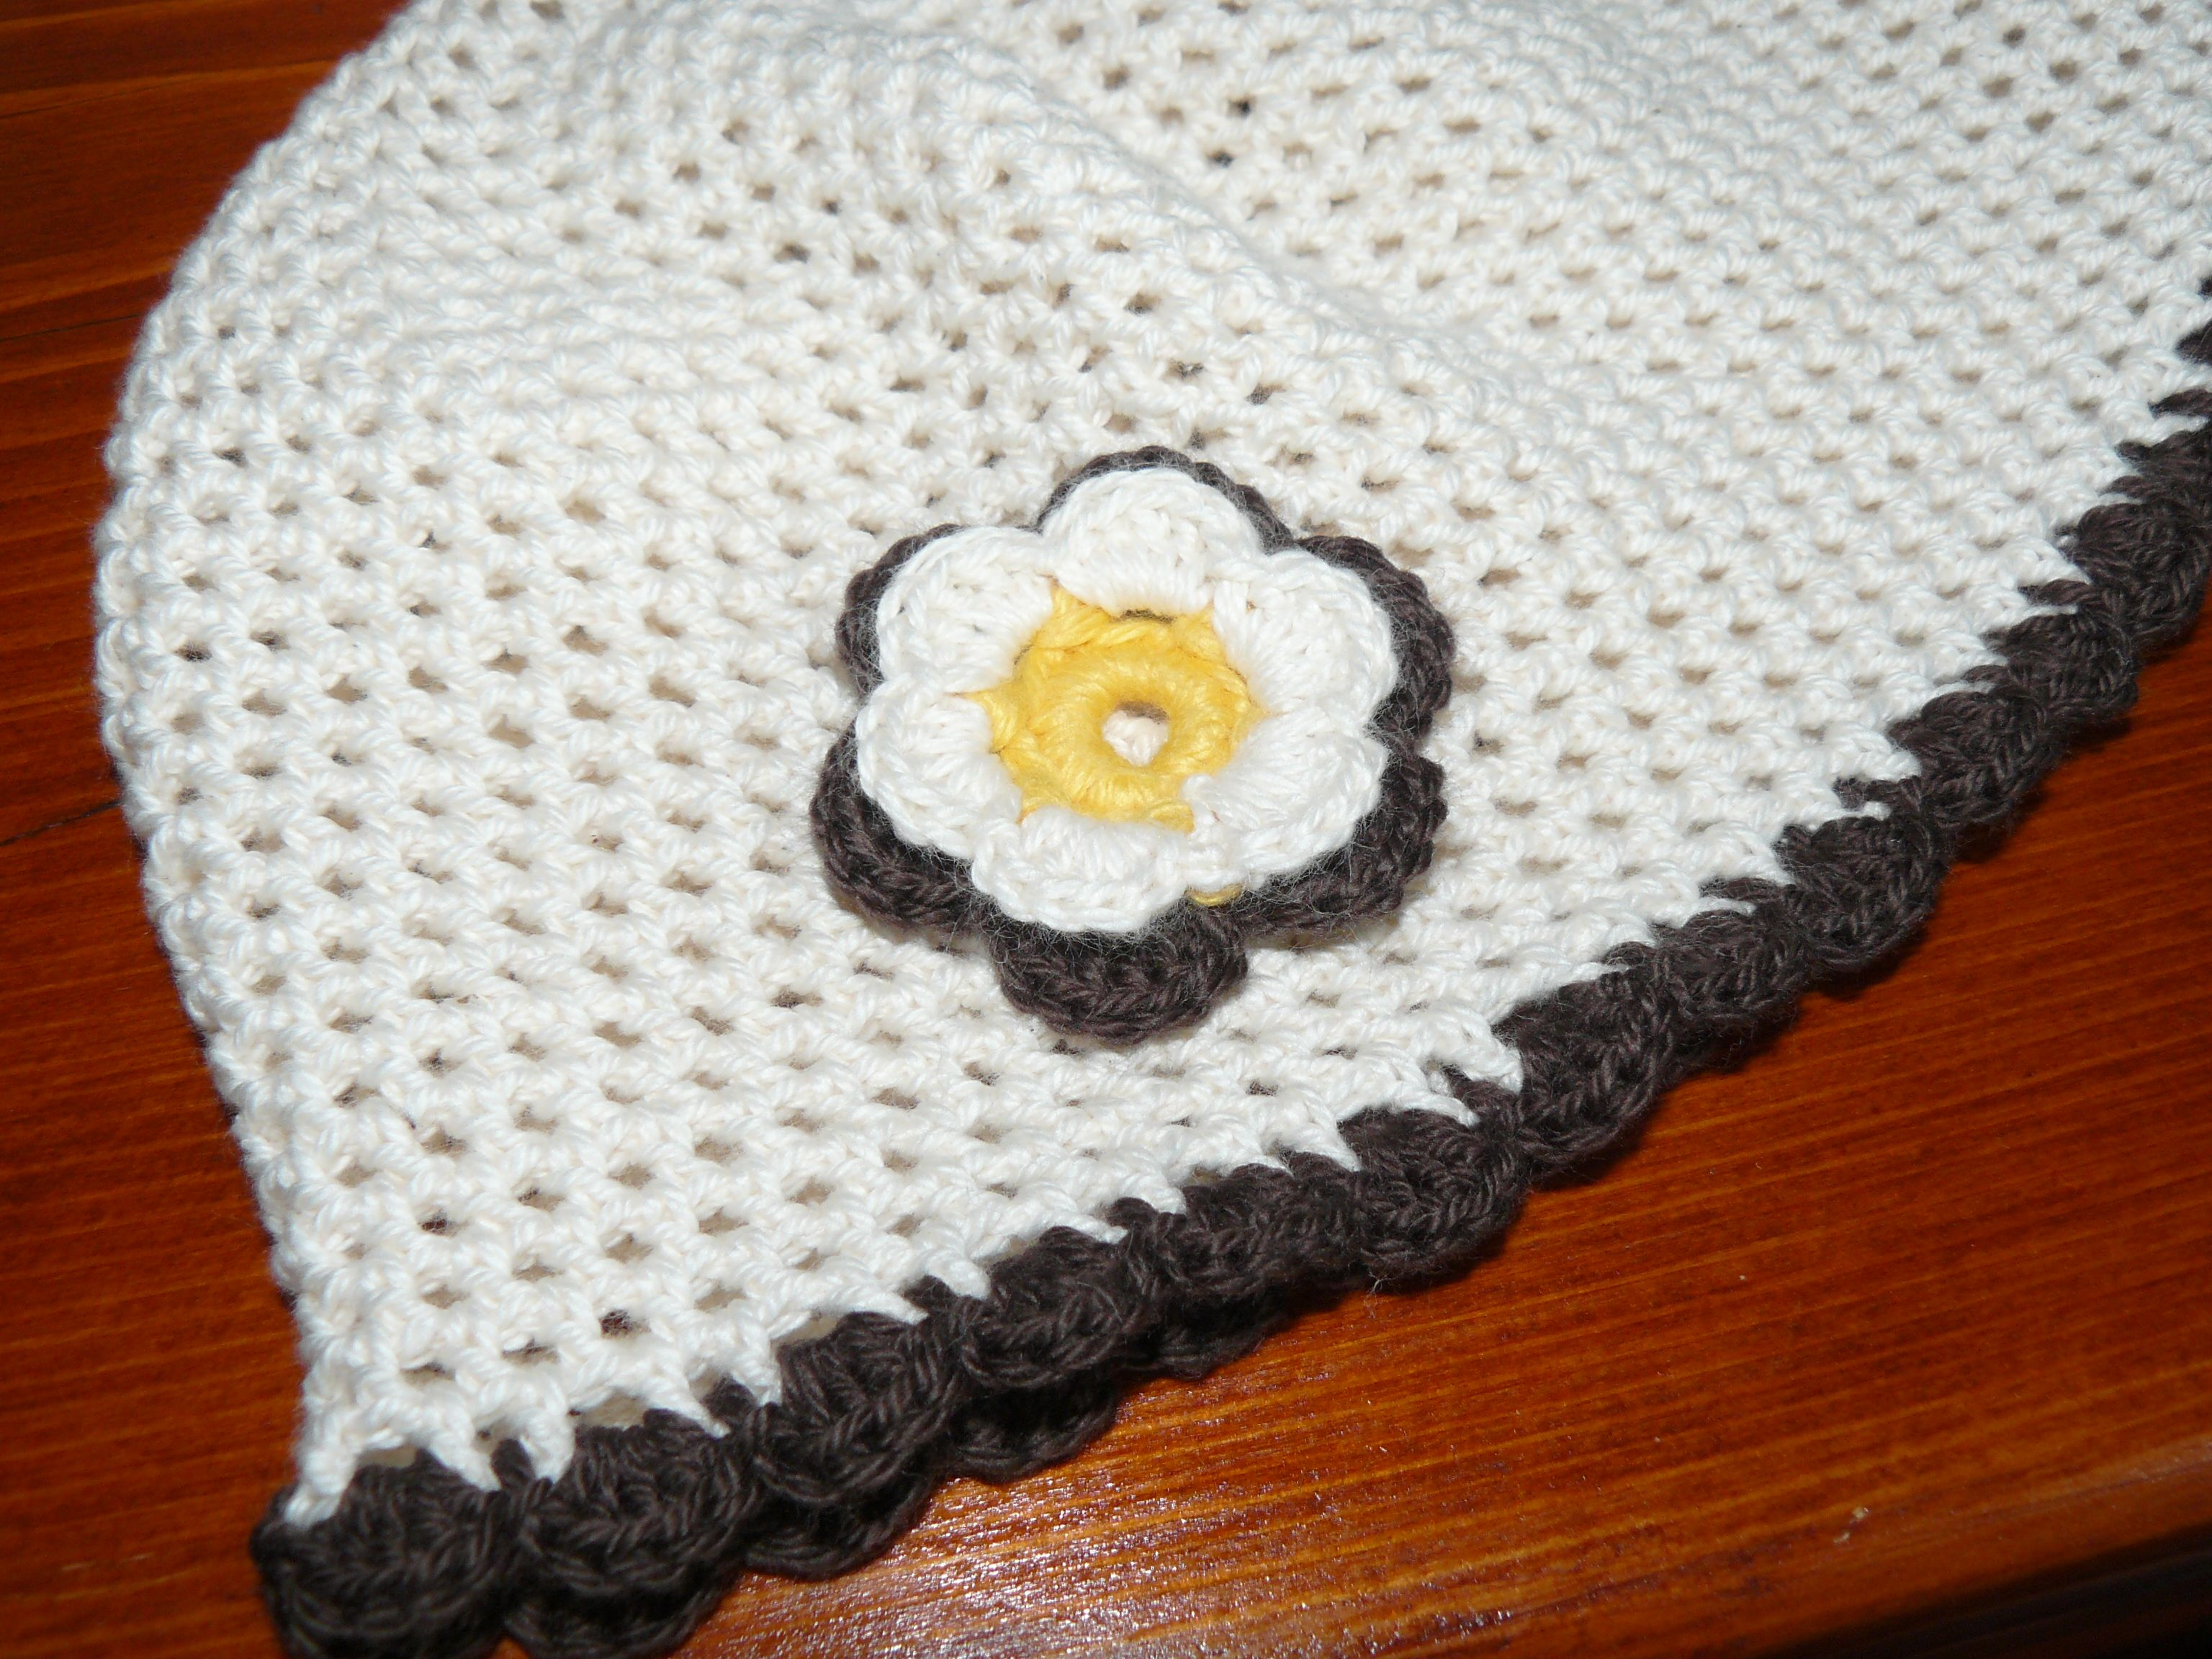 Pin de desi ivanova en hat&scarf | Pinterest